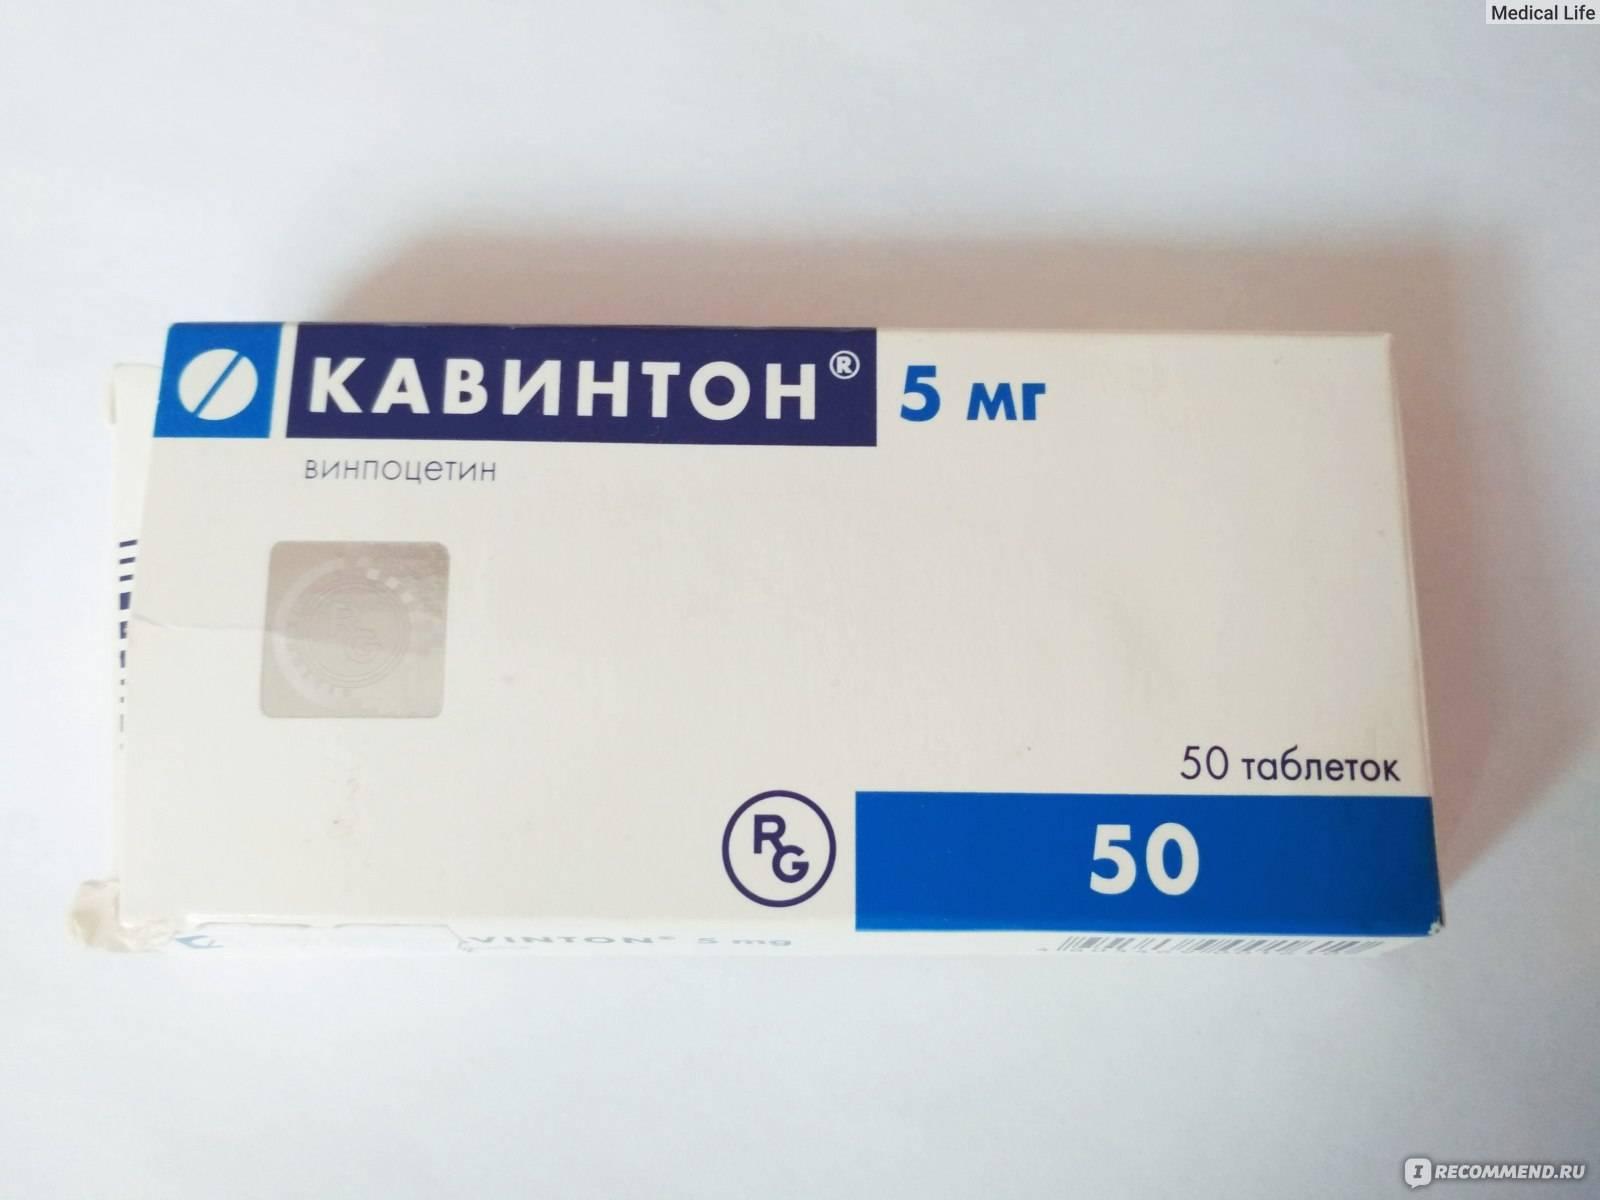 Кавинтон комфорте аналоги. цены на аналоги в аптеках